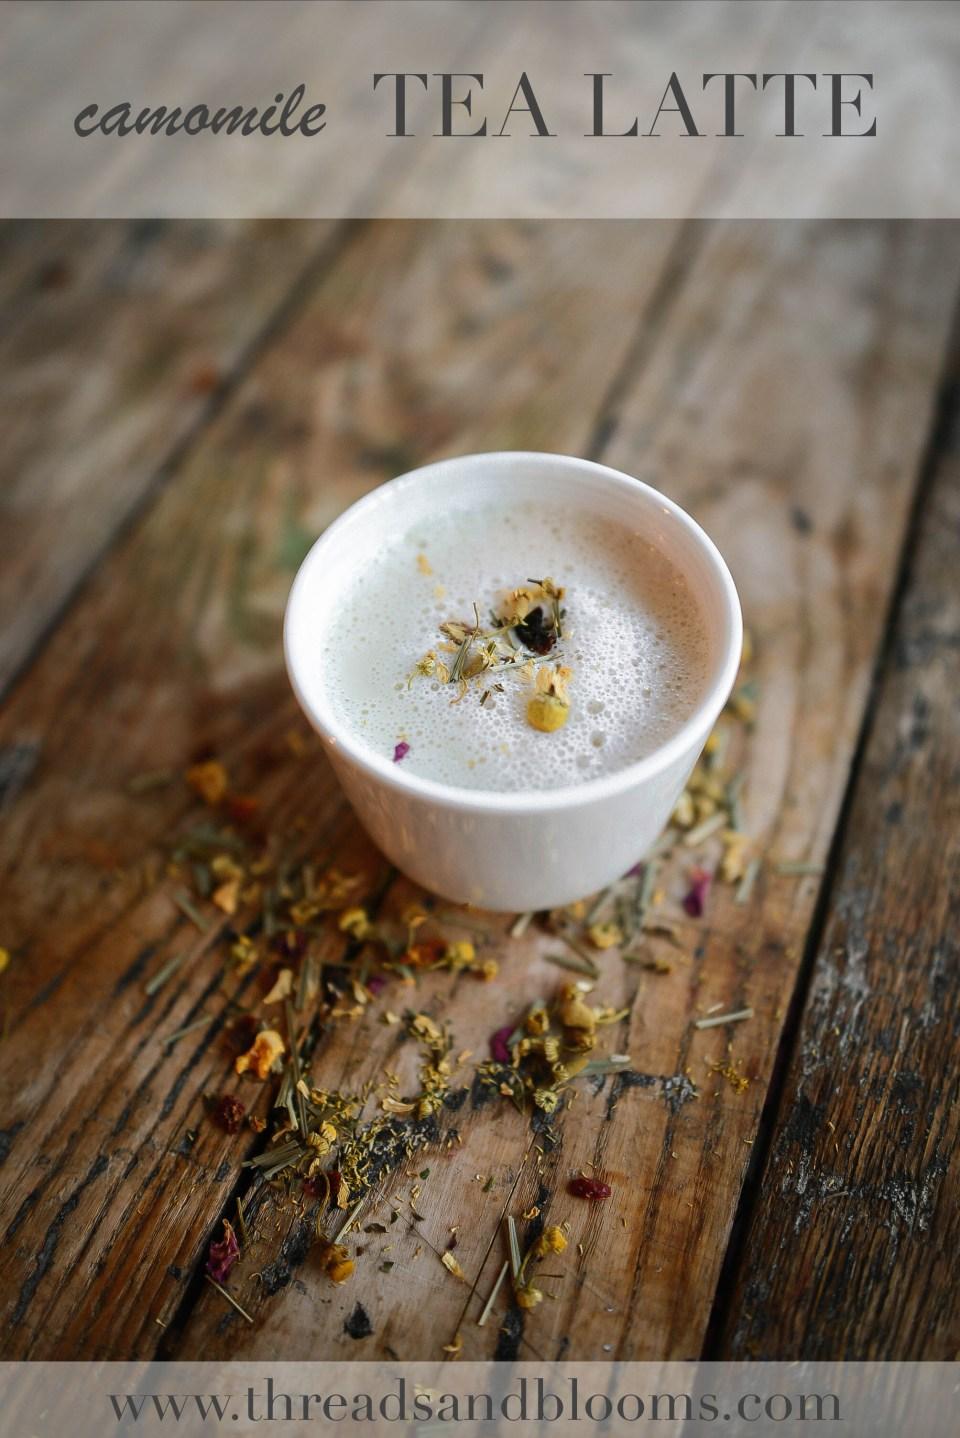 Camomile Tea Latte